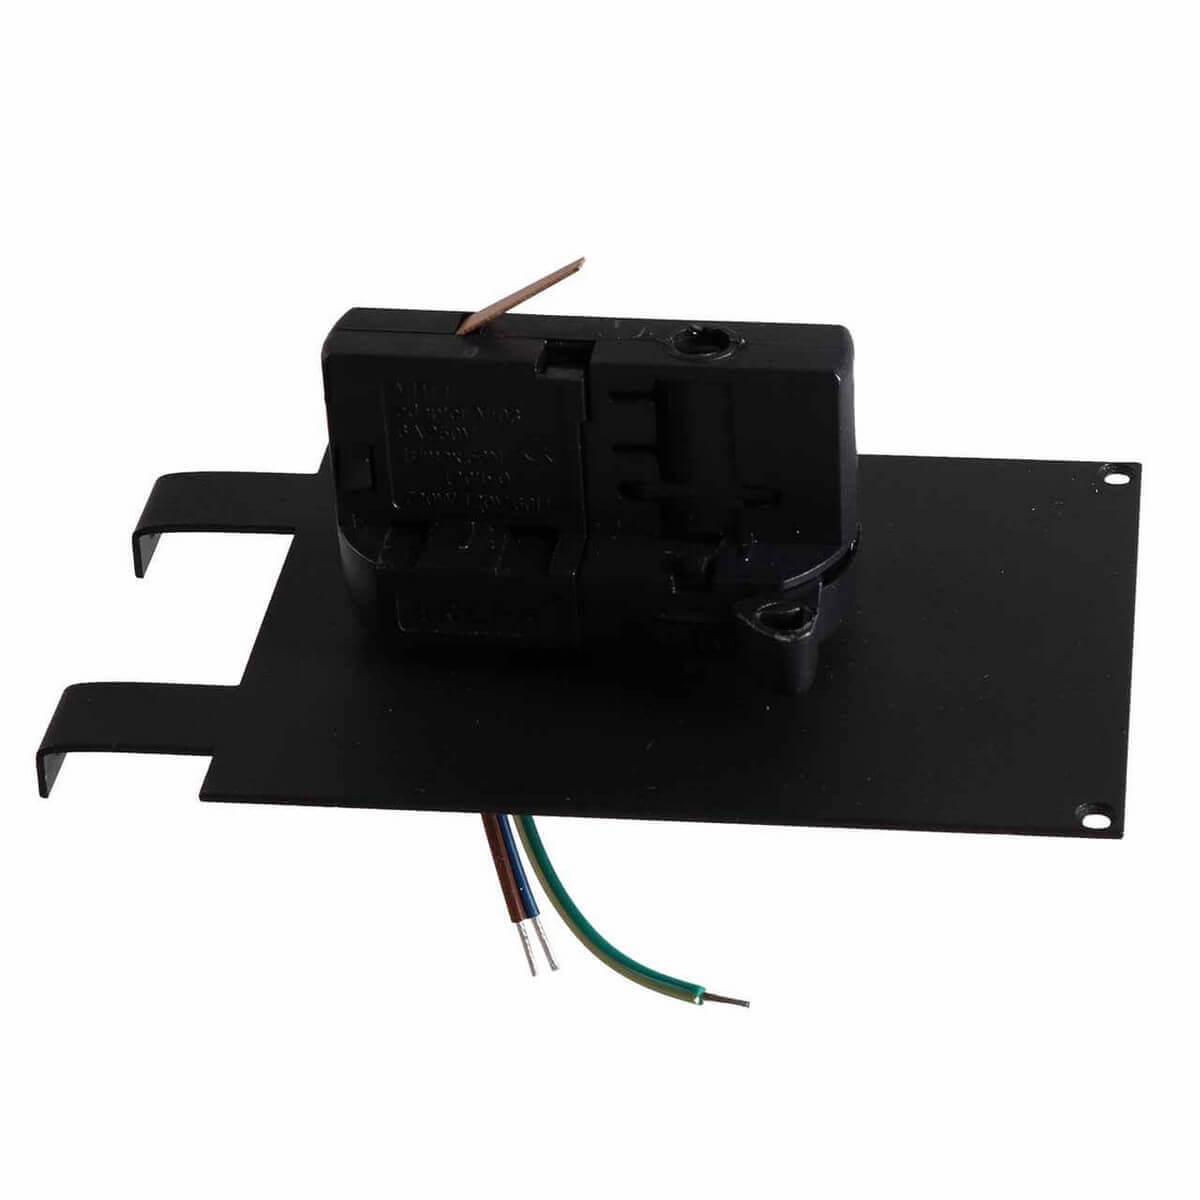 Адаптер для шинопровода Lightstar 594037 Asta Black (для трехфазного шинопровода)